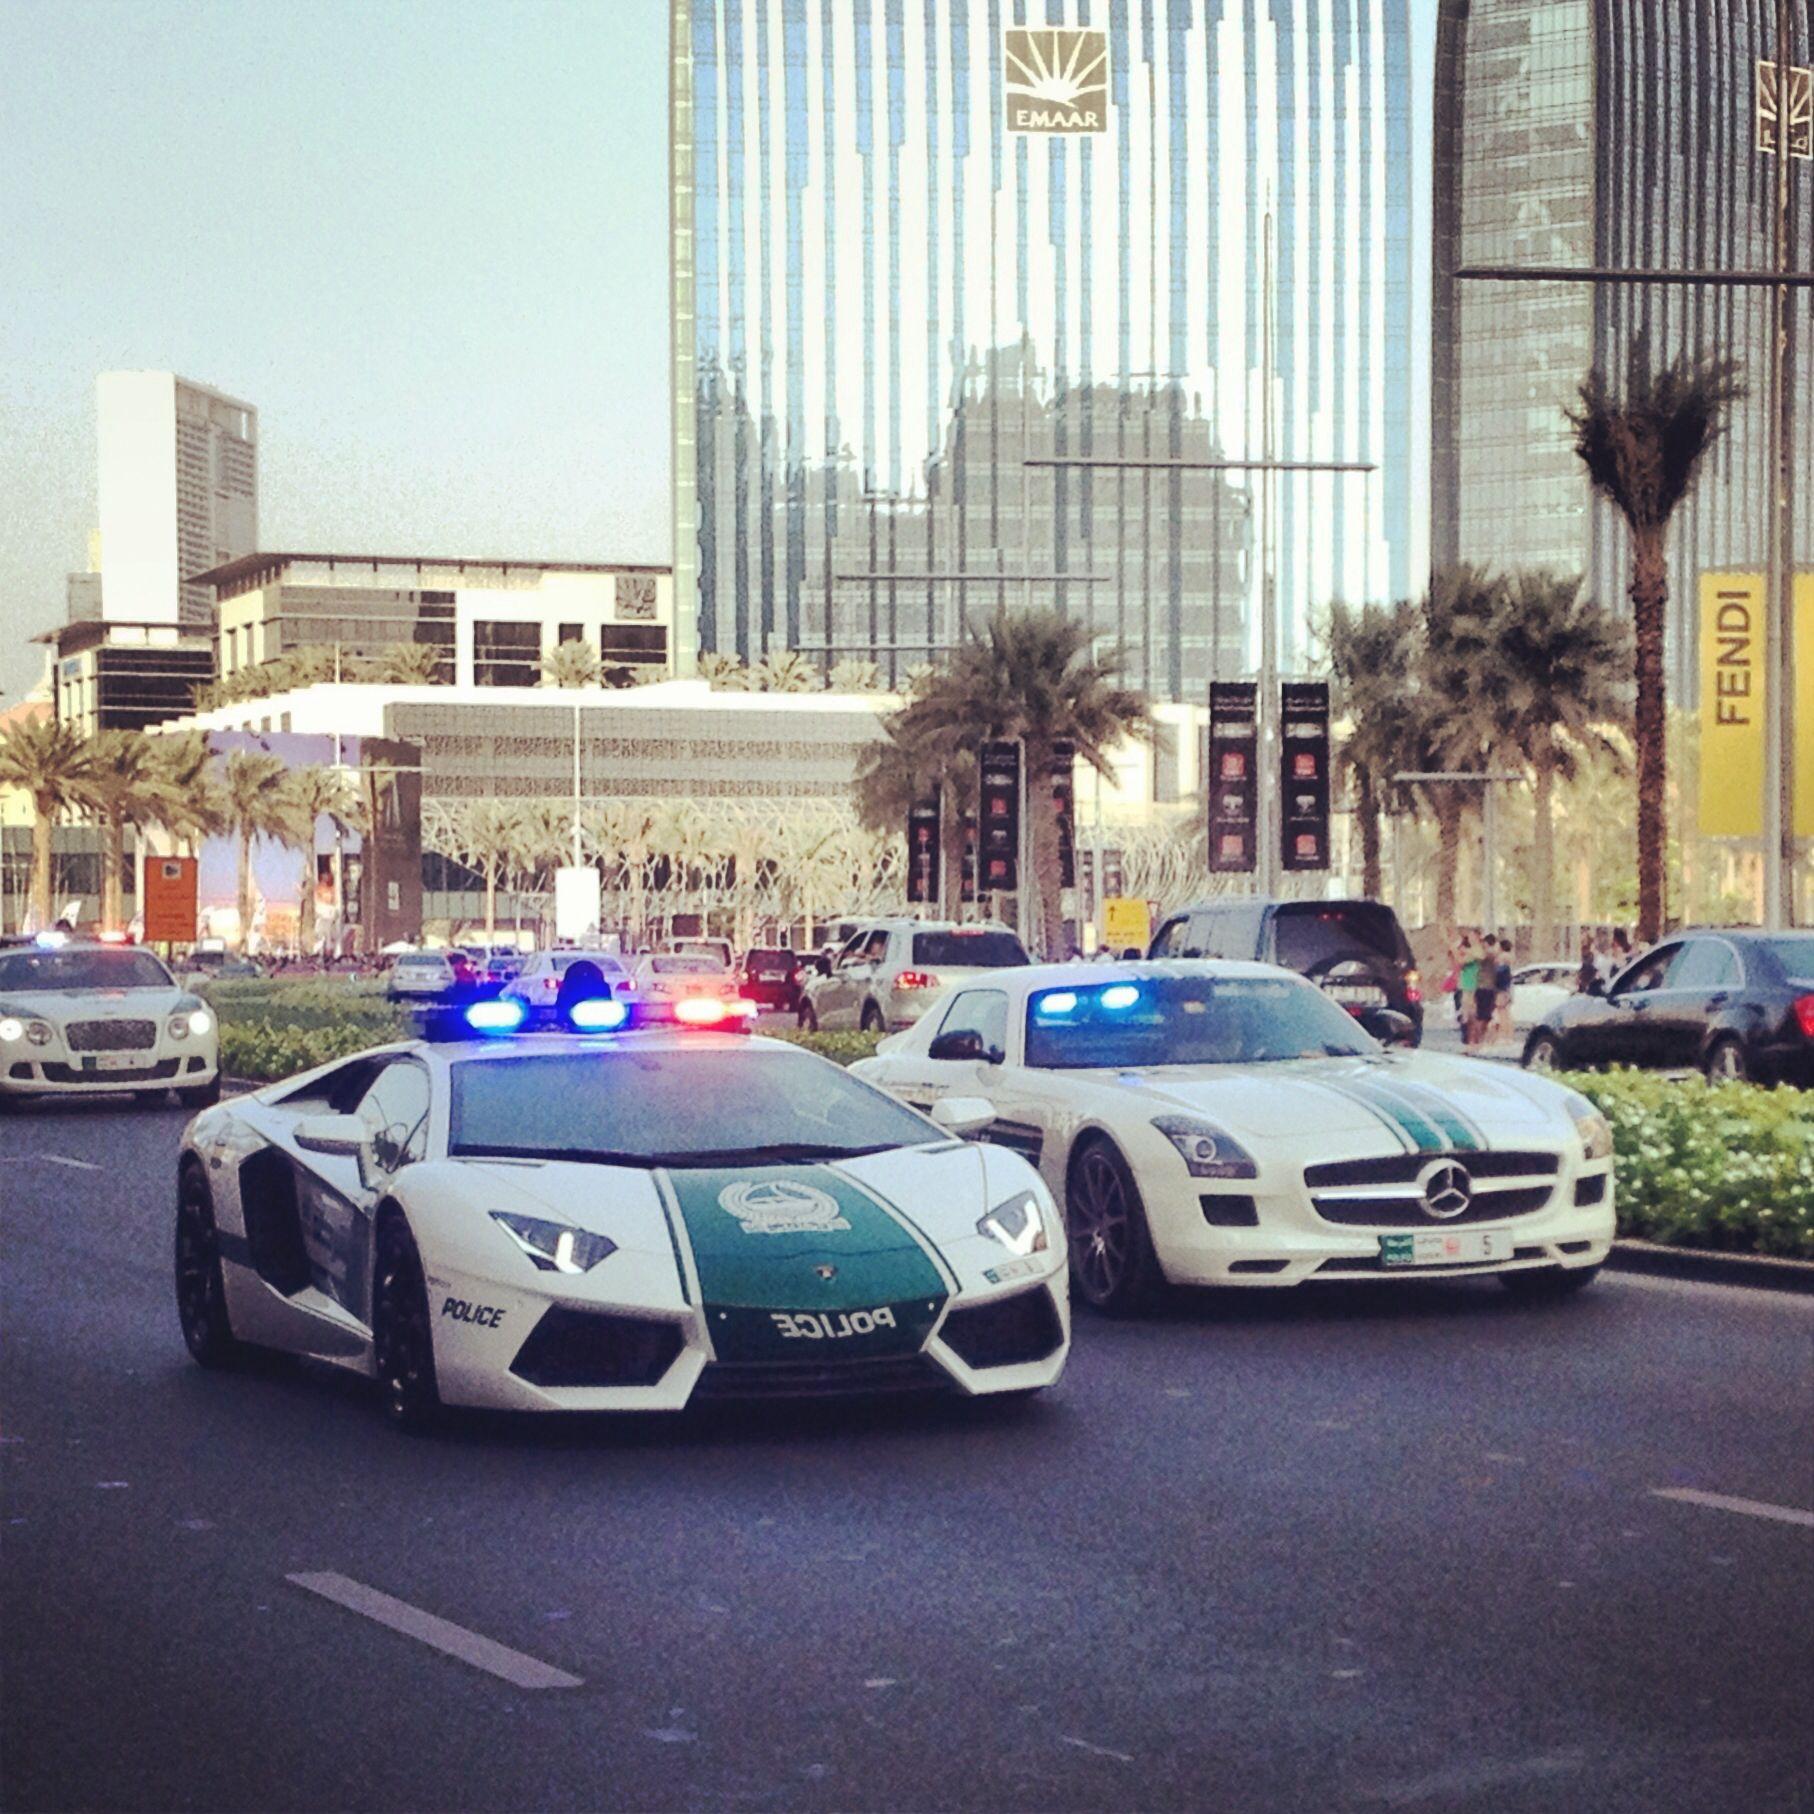 Dubai police force arrived on the scene